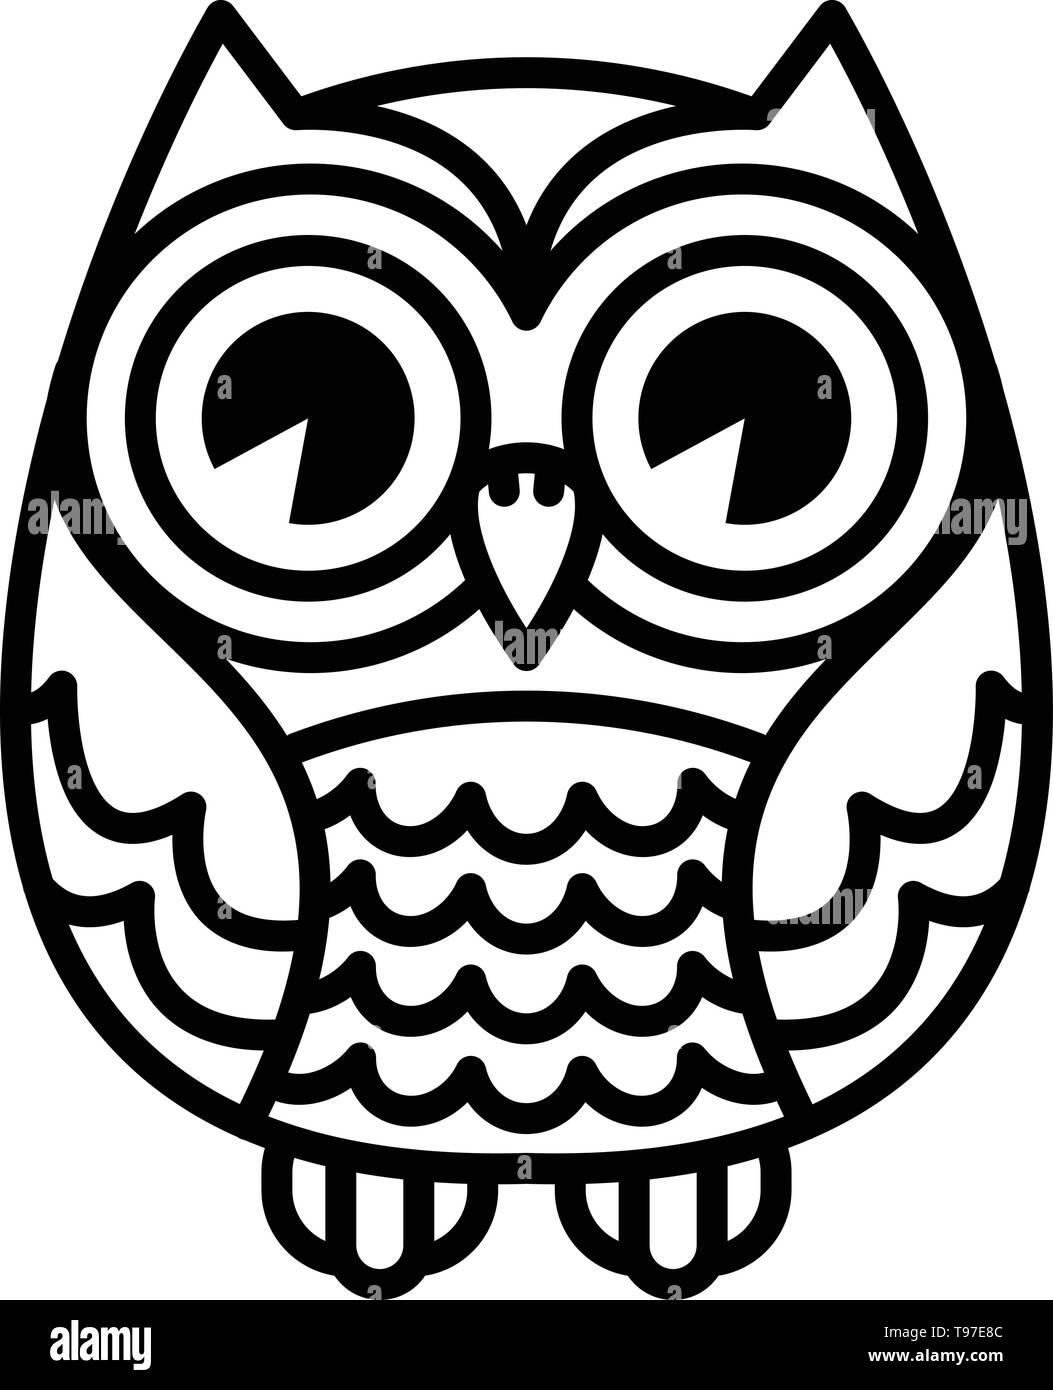 Cute Cartoon Owl Bird With Big Eyes In Sitting Position Stock Vector Image Art Alamy